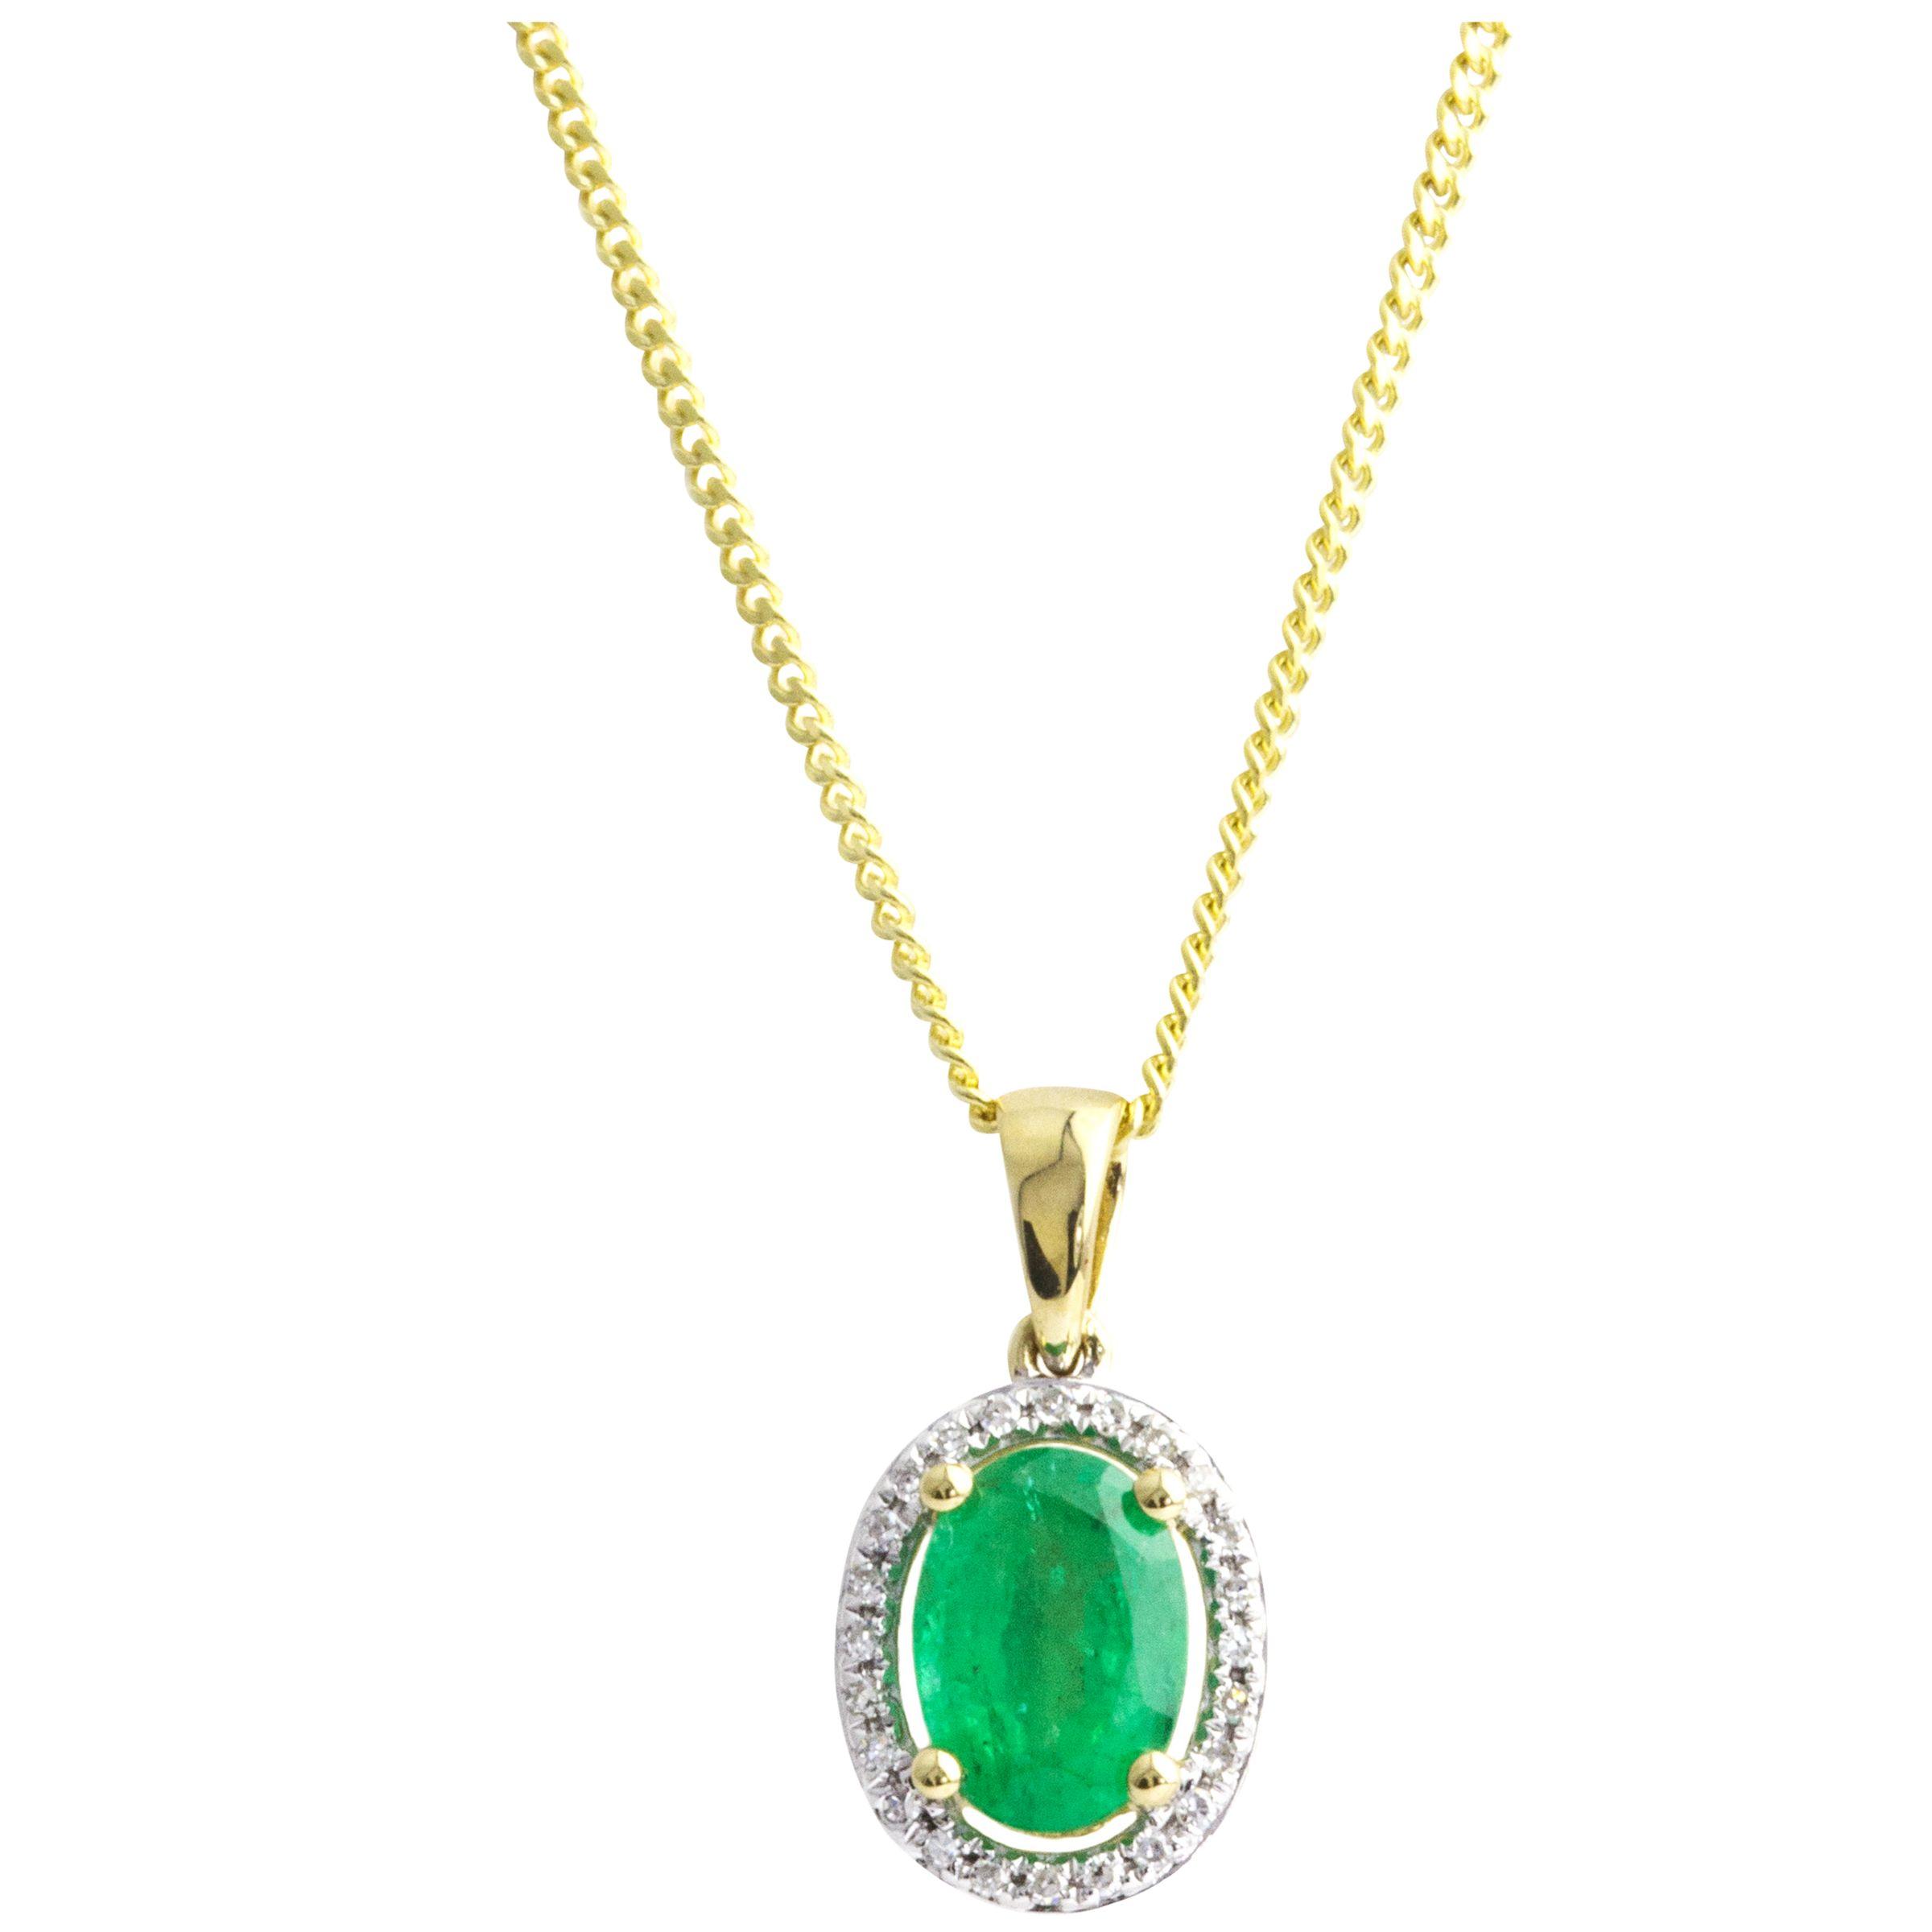 A B Davis A B Davis 9ct Gold Emerald and Diamond Oval Pendant Necklace